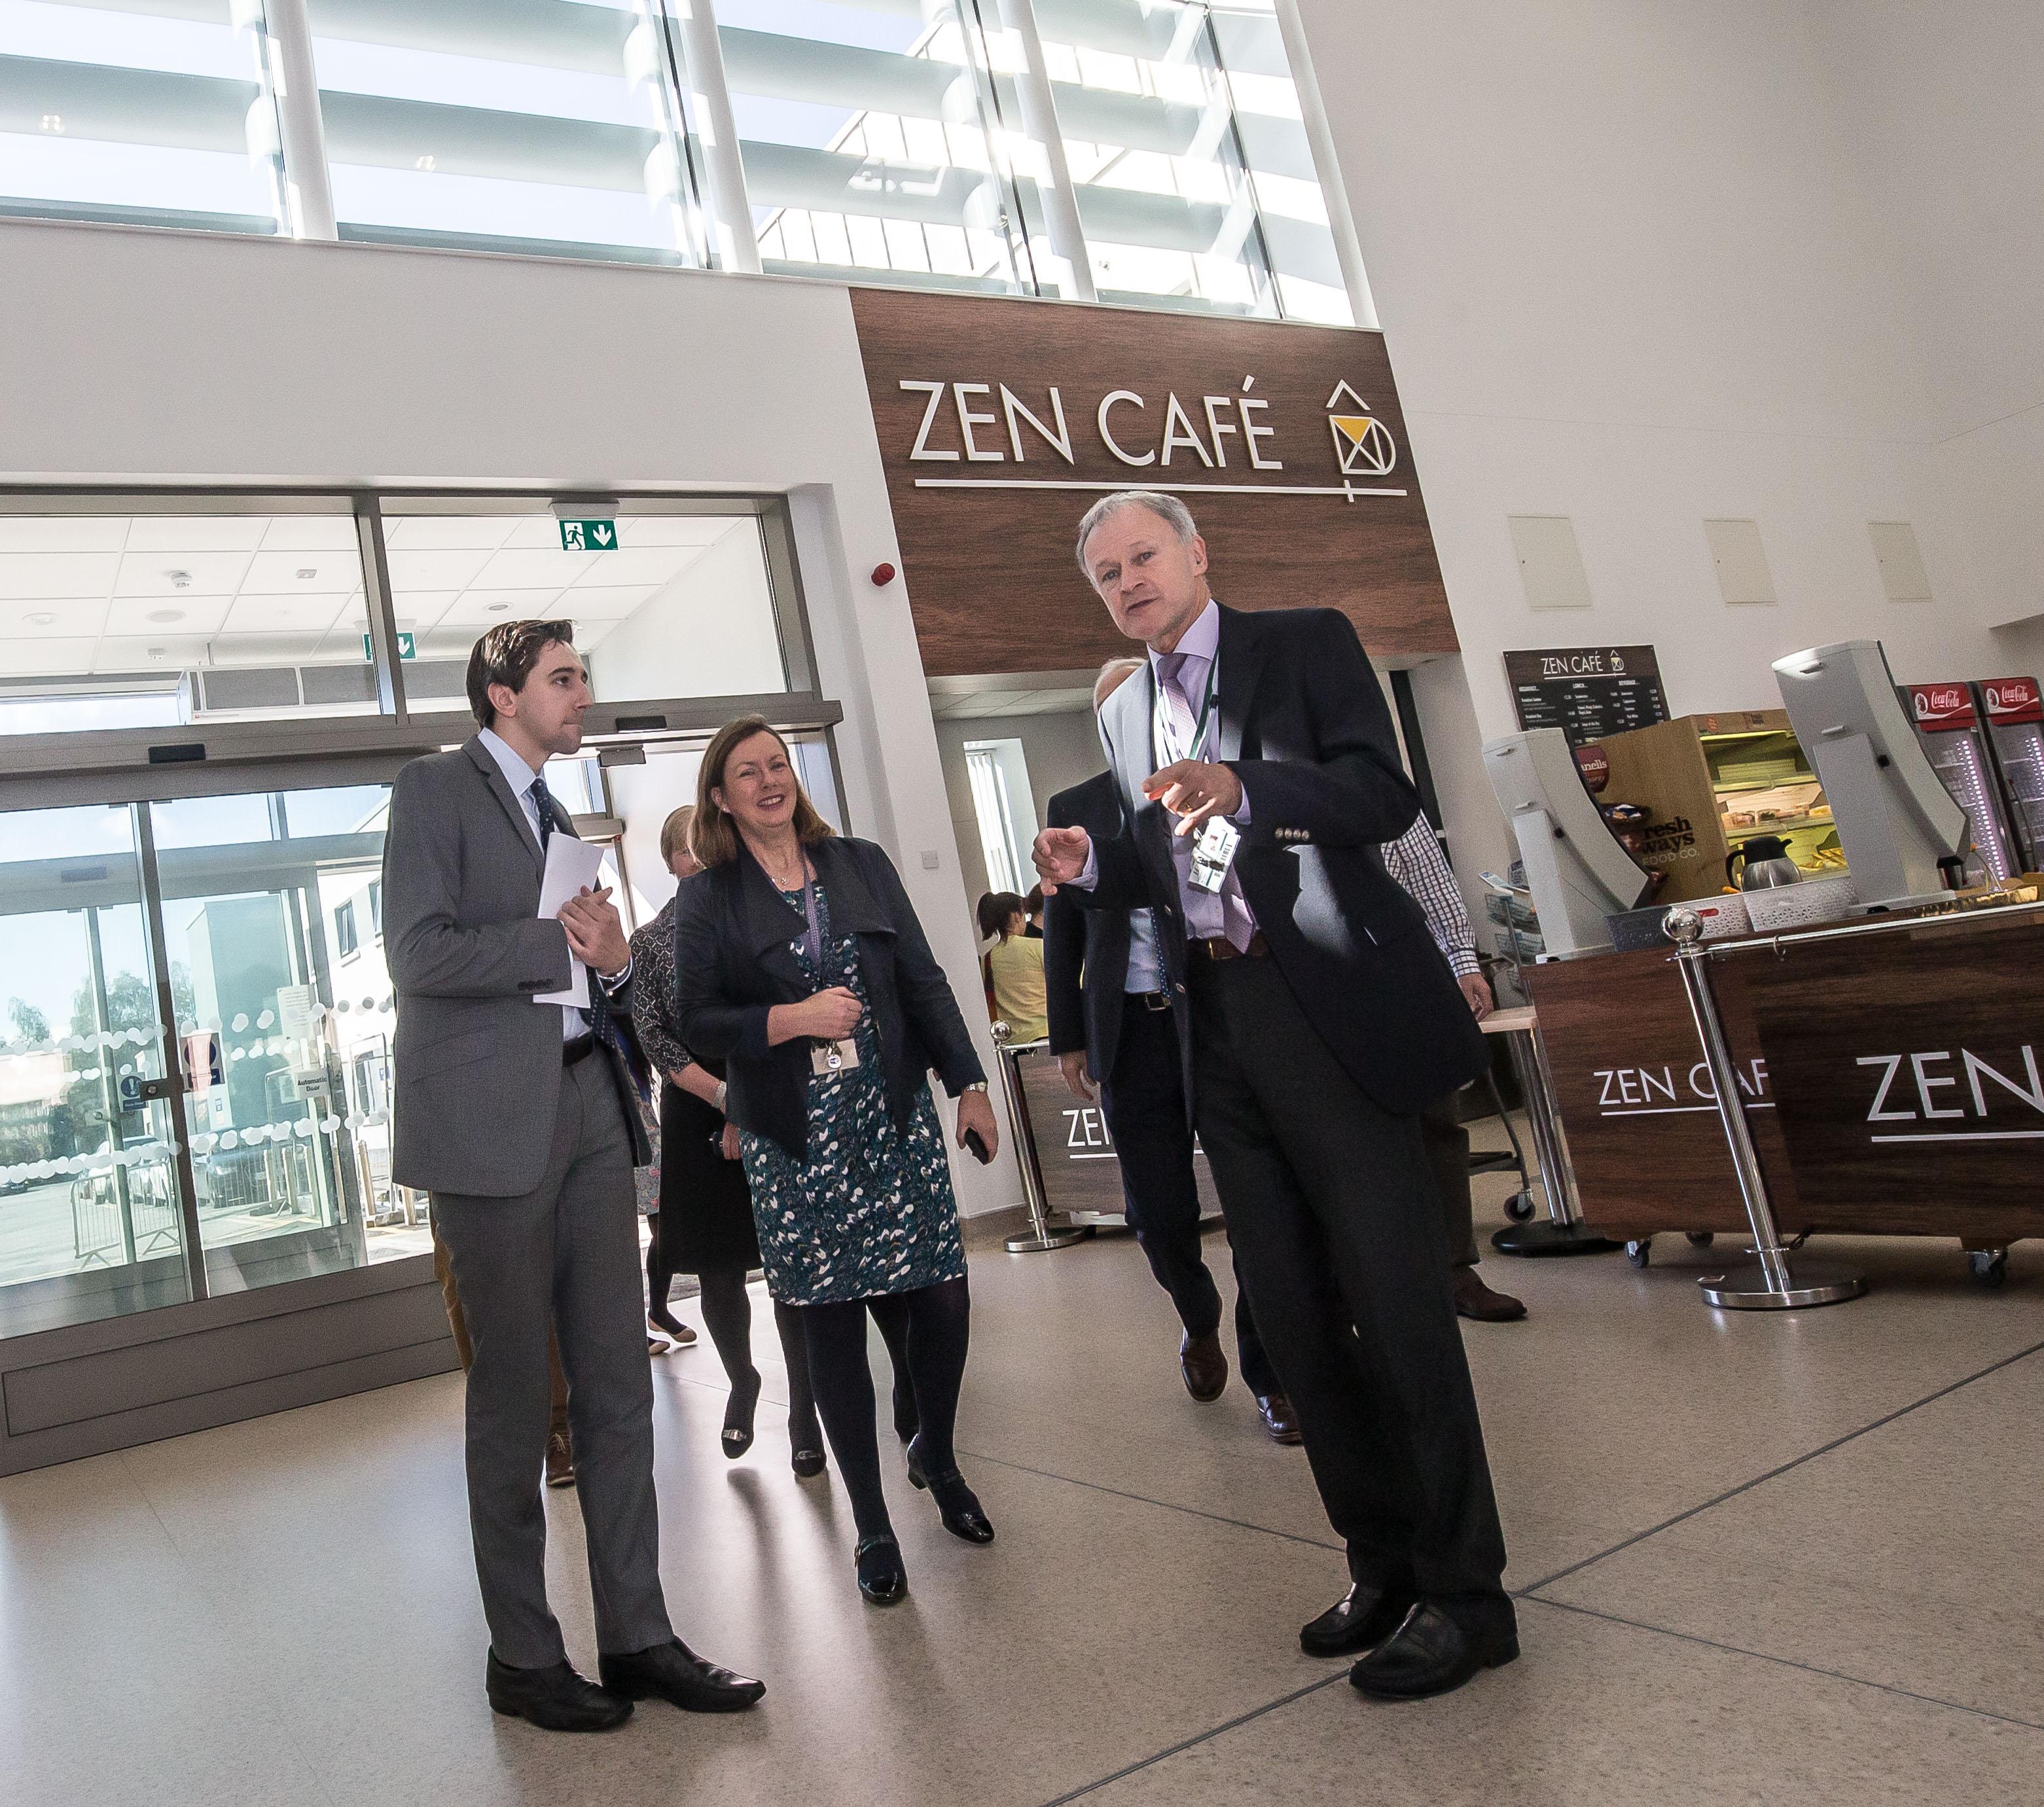 Minister for Health, Zen Café